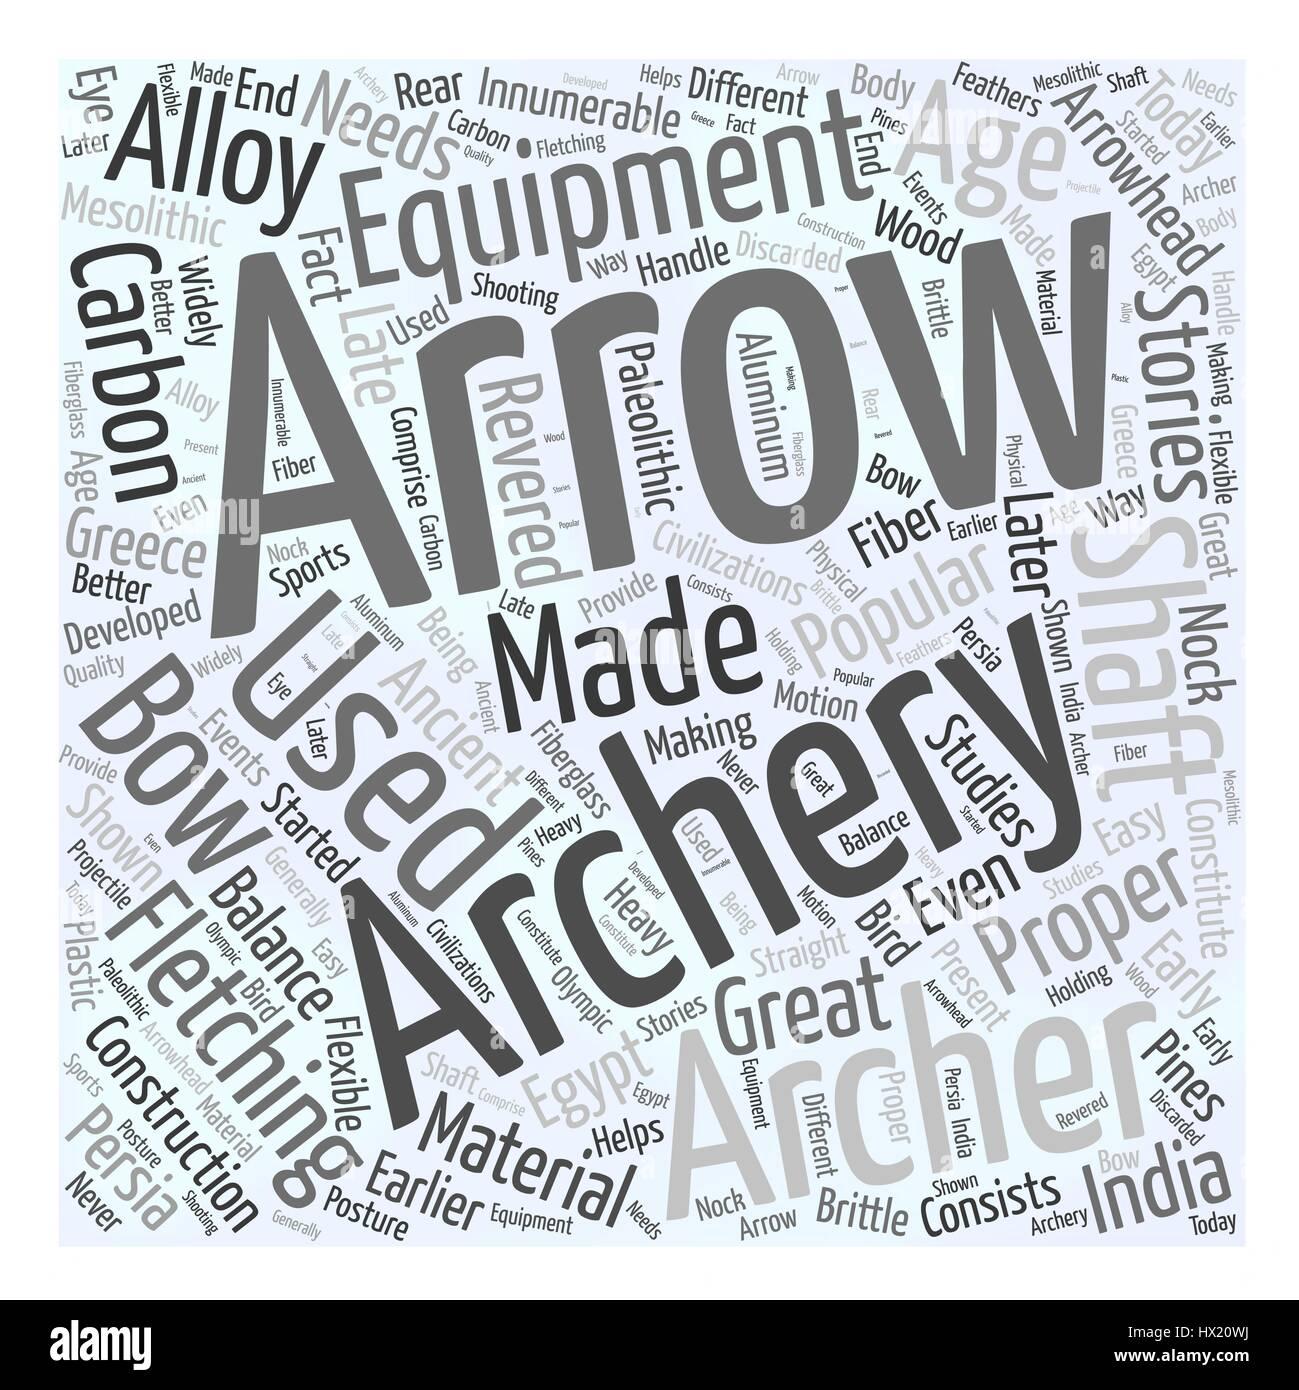 archery equipment Word Cloud Concept - Stock Image